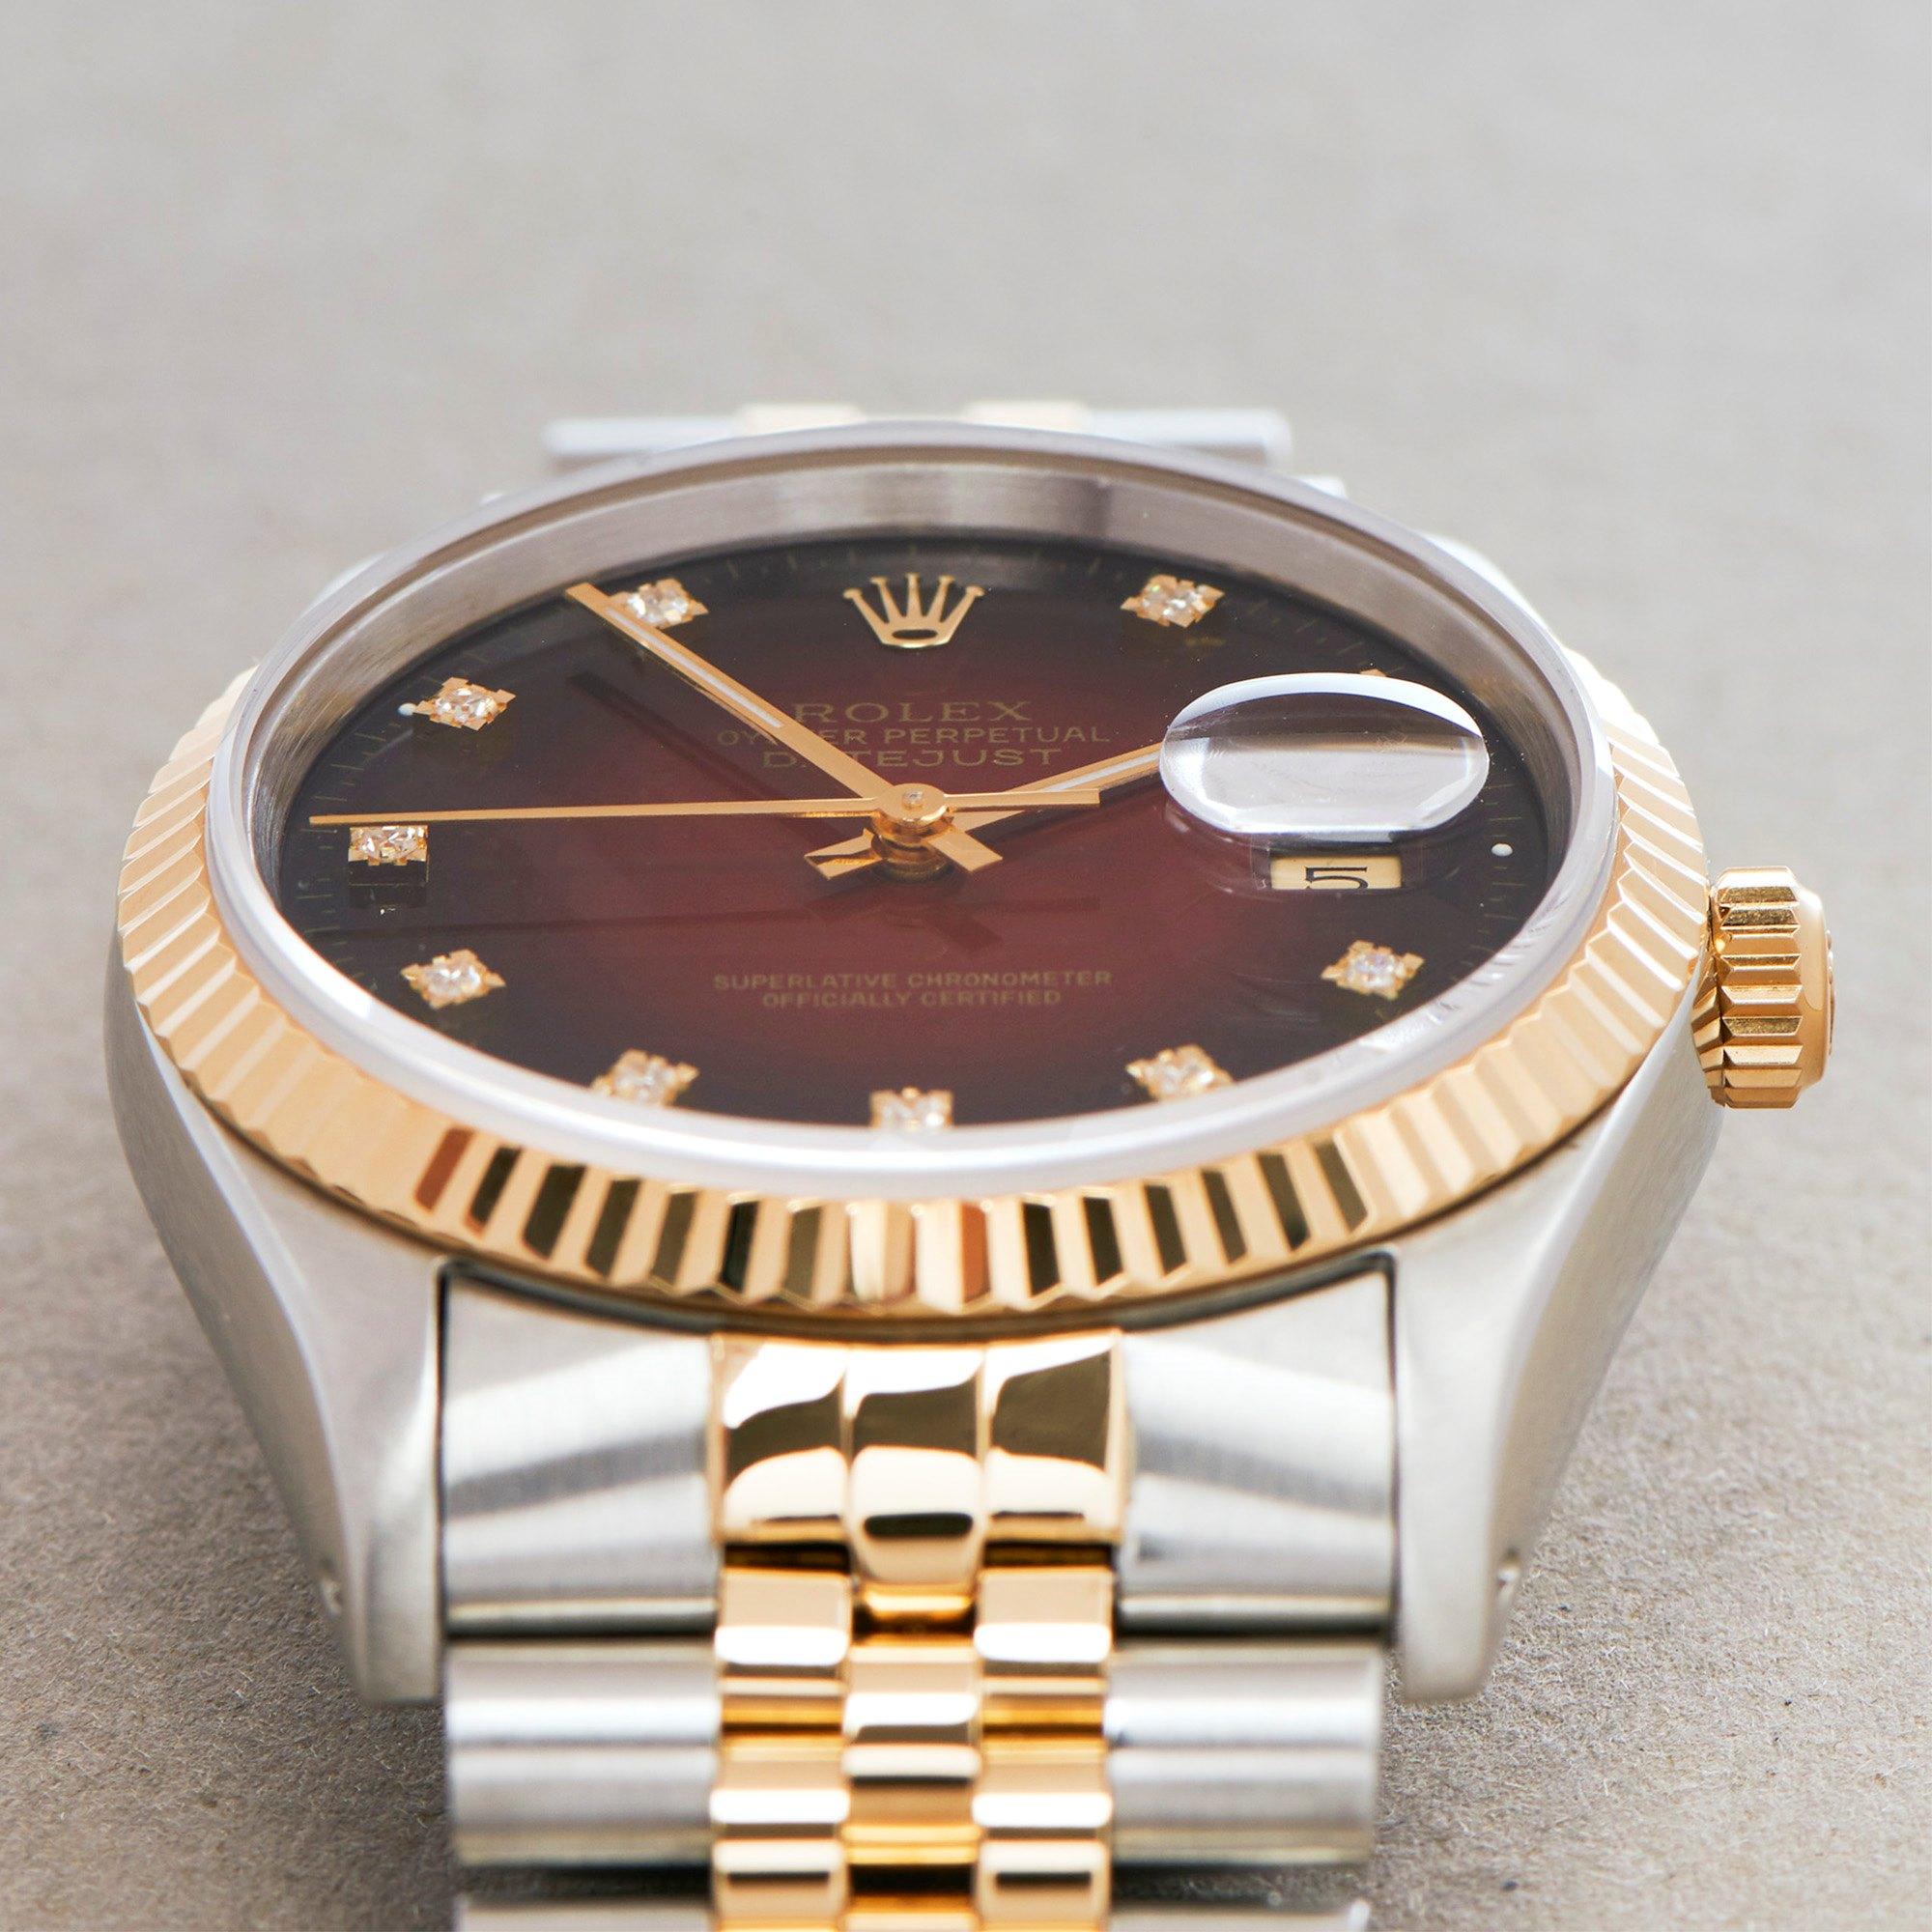 Rolex Datejust 36 Vignette 18K Yellow Gold & Stainless Steel 16233G